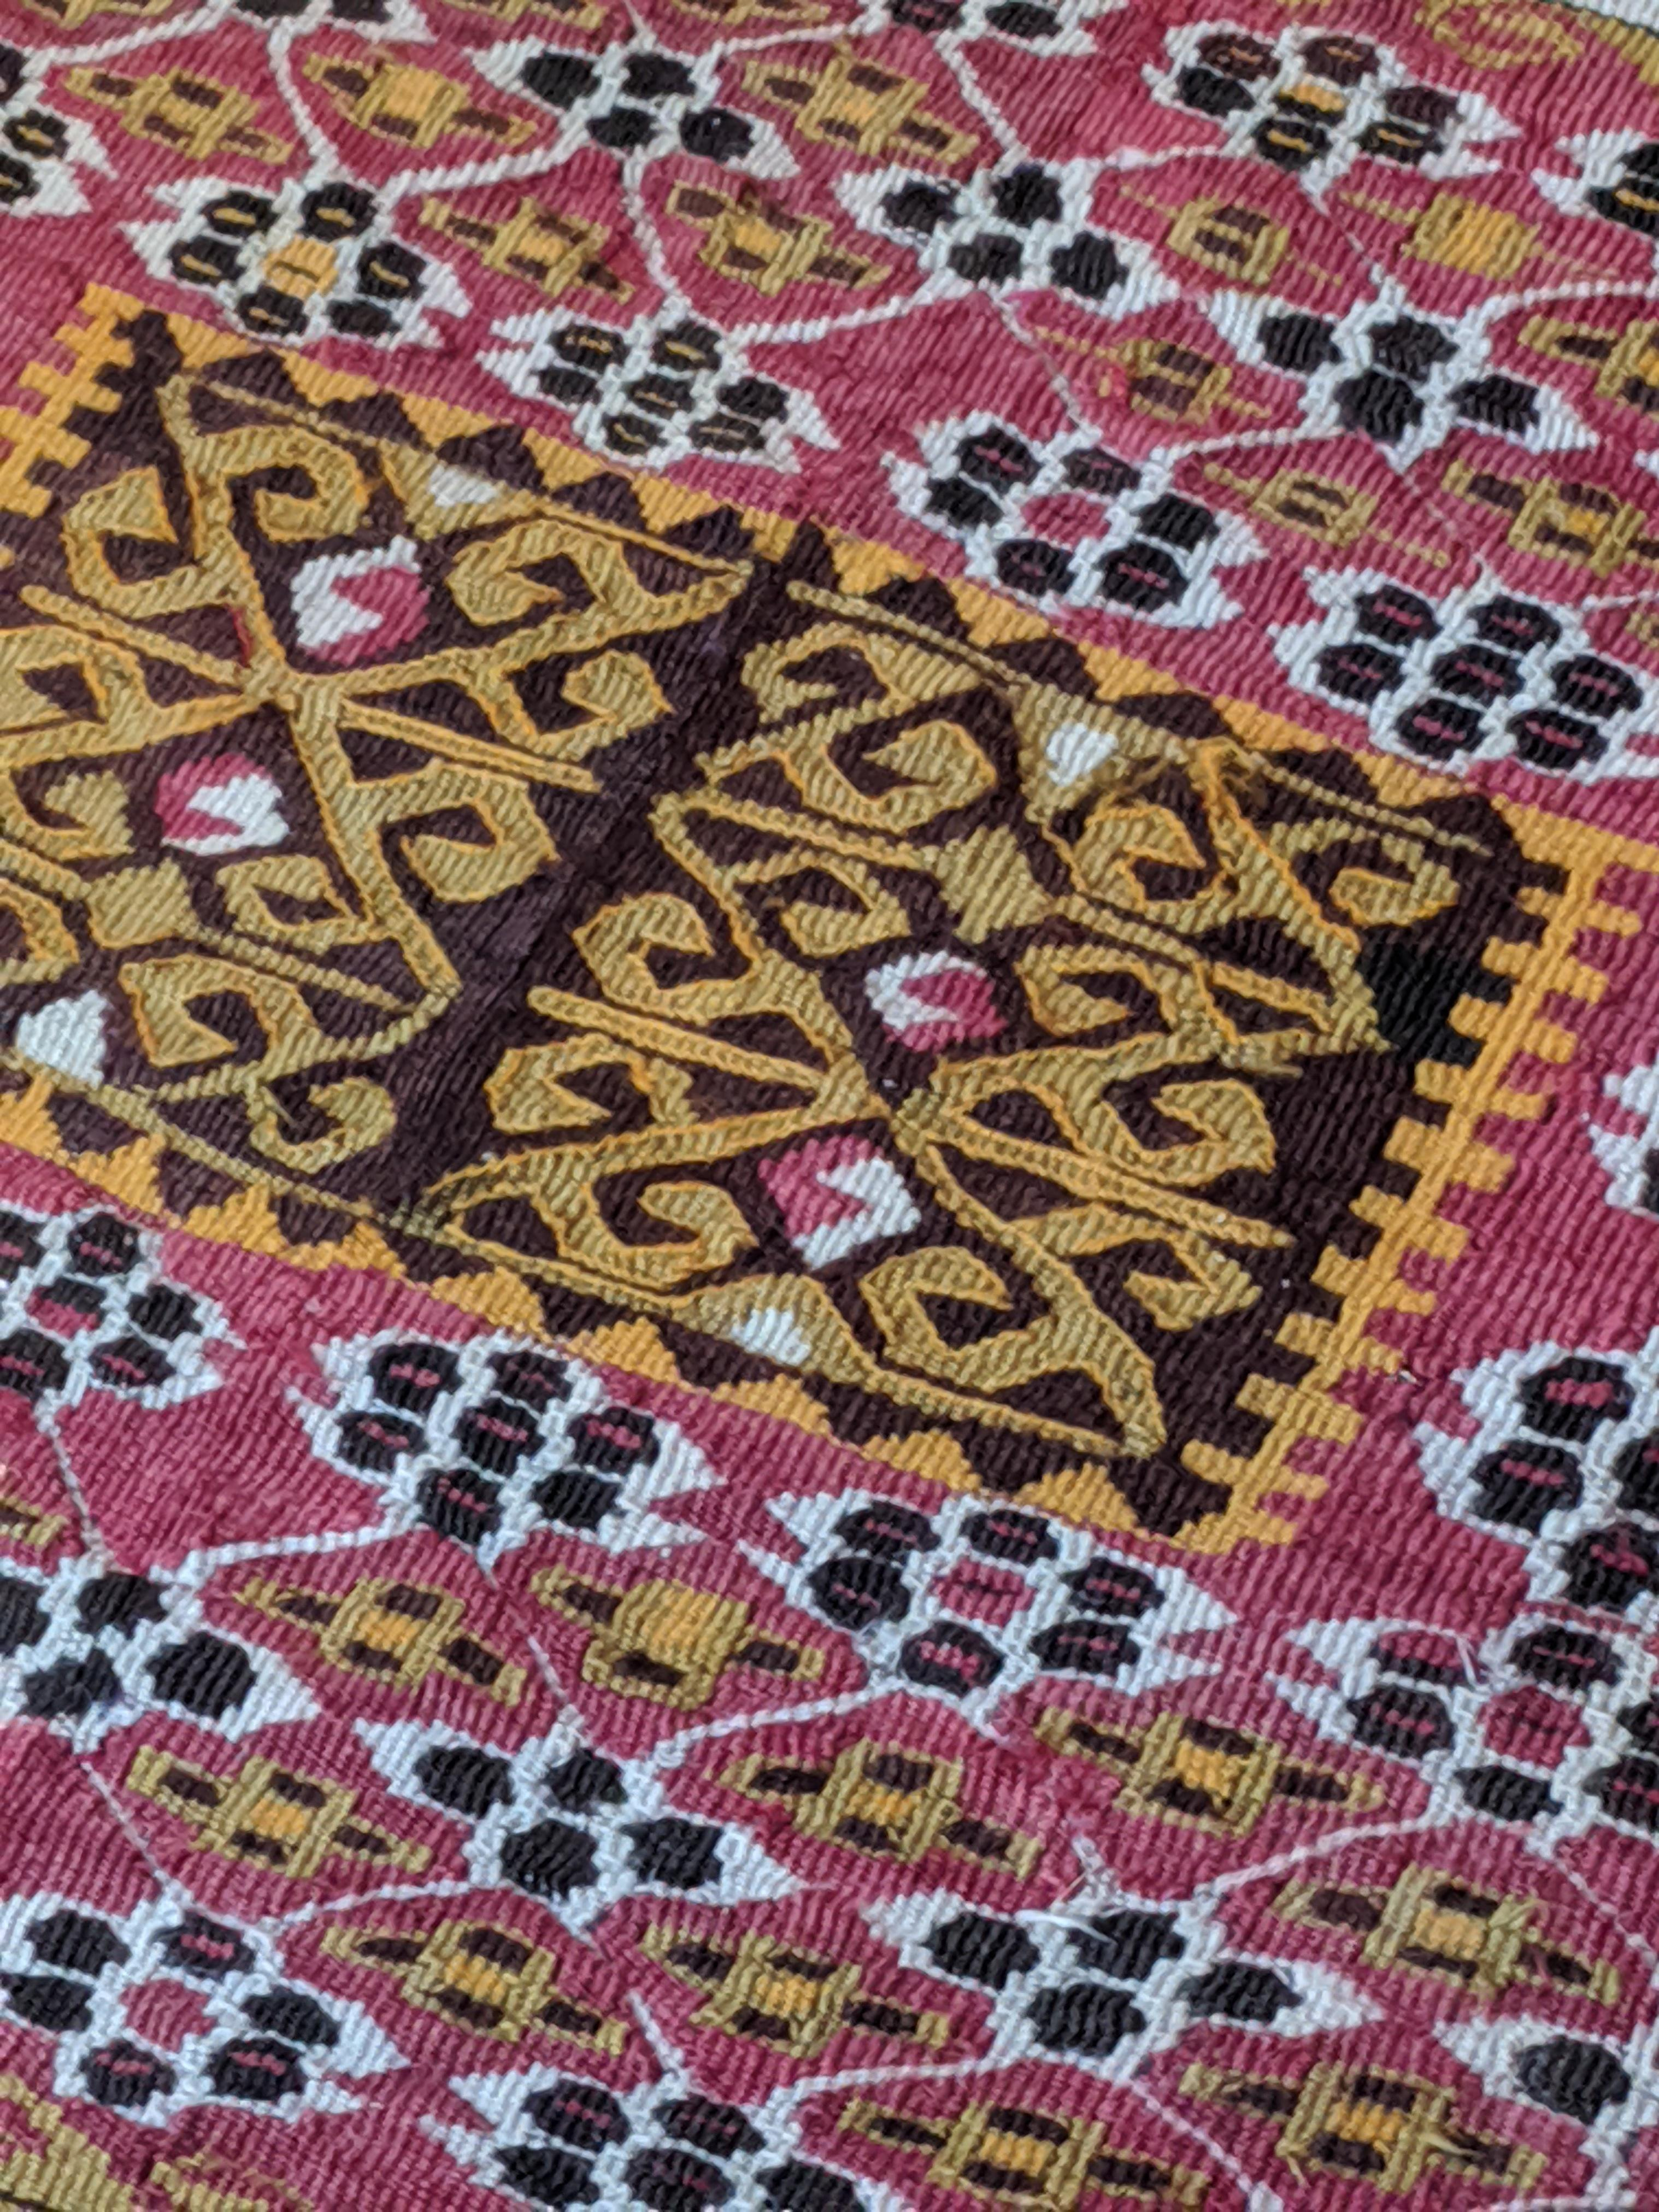 ODETTA at Home, Textiles, Vintage Anatolian Kayseri Kilim, early 20th c, wool